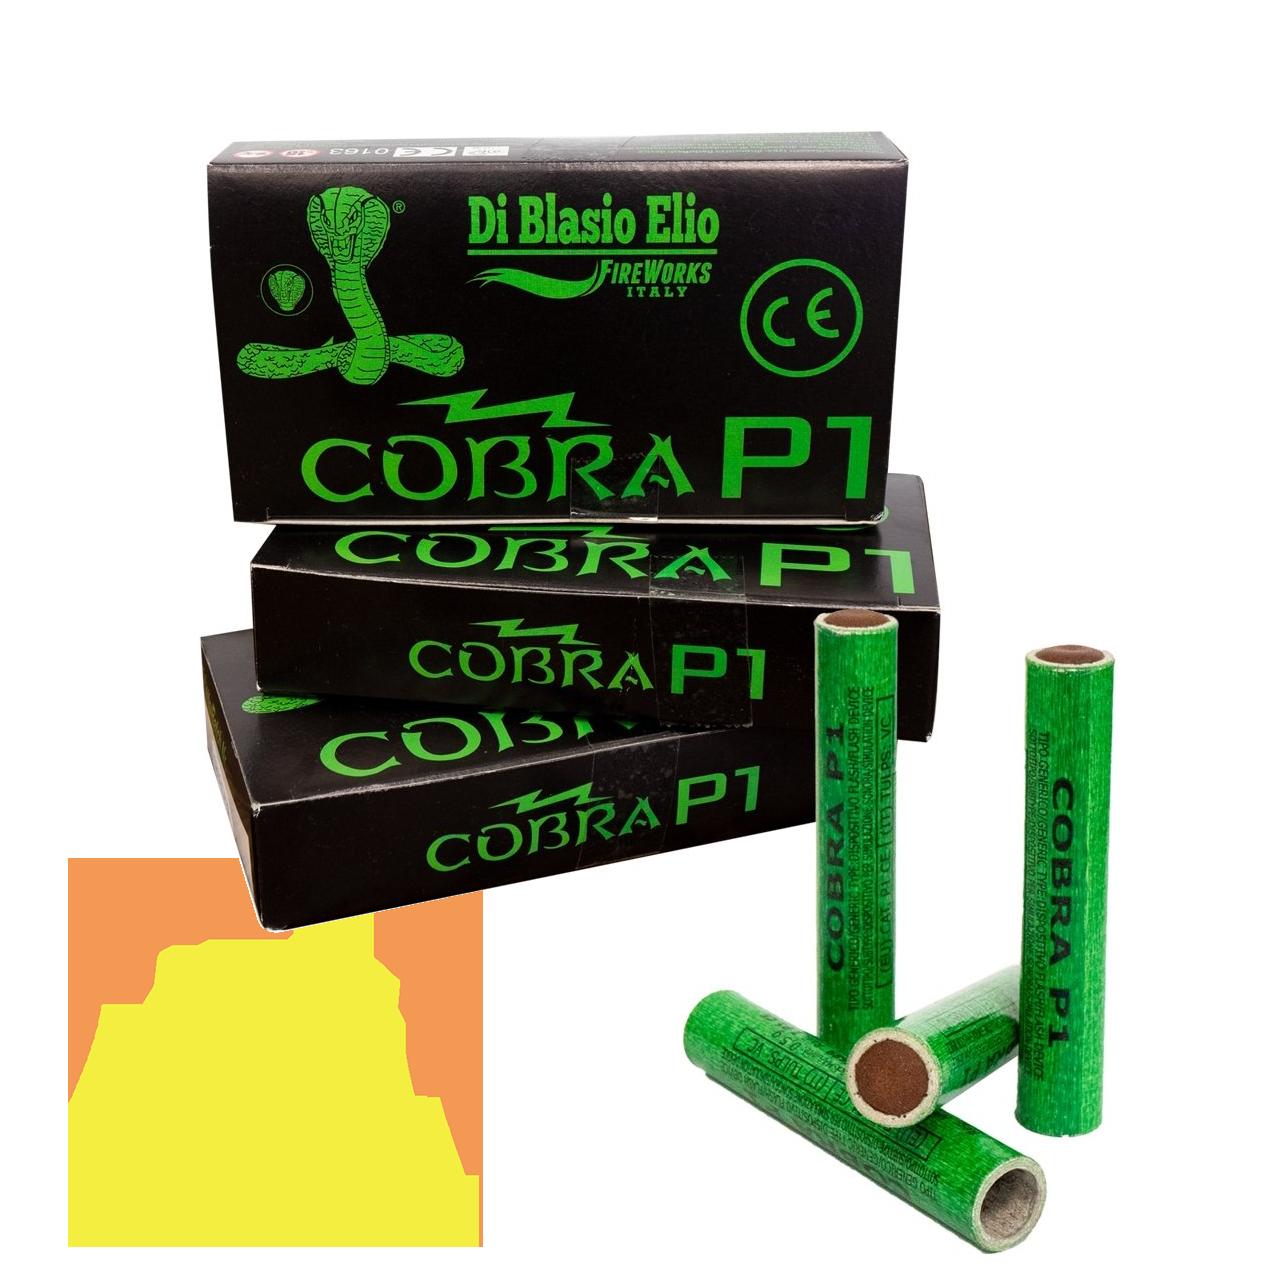 Cobra P1 Nitraten Di Blasio Elio Fireworks